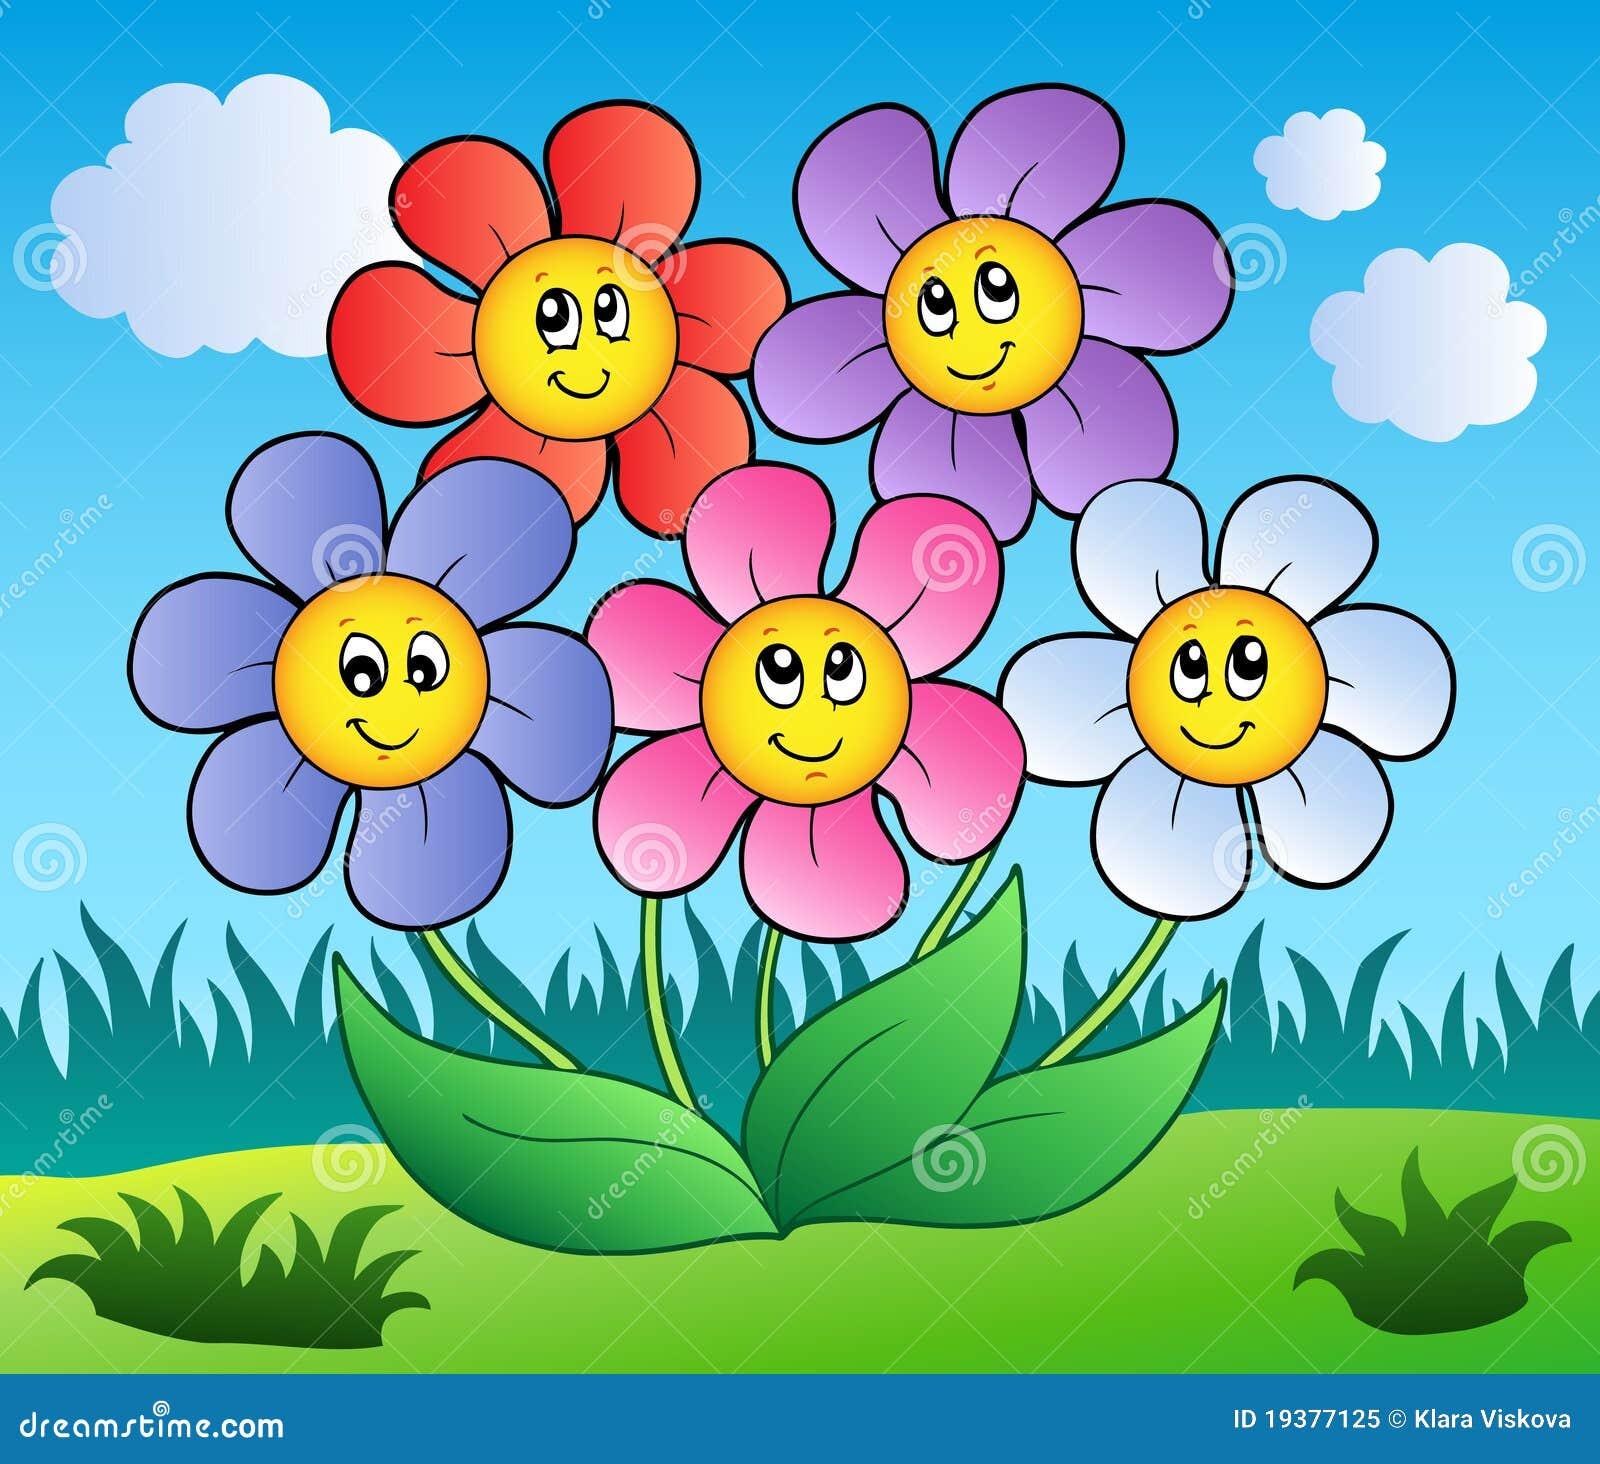 Five Cartoon Flowers On Meadow Royalty Free Stock Photo